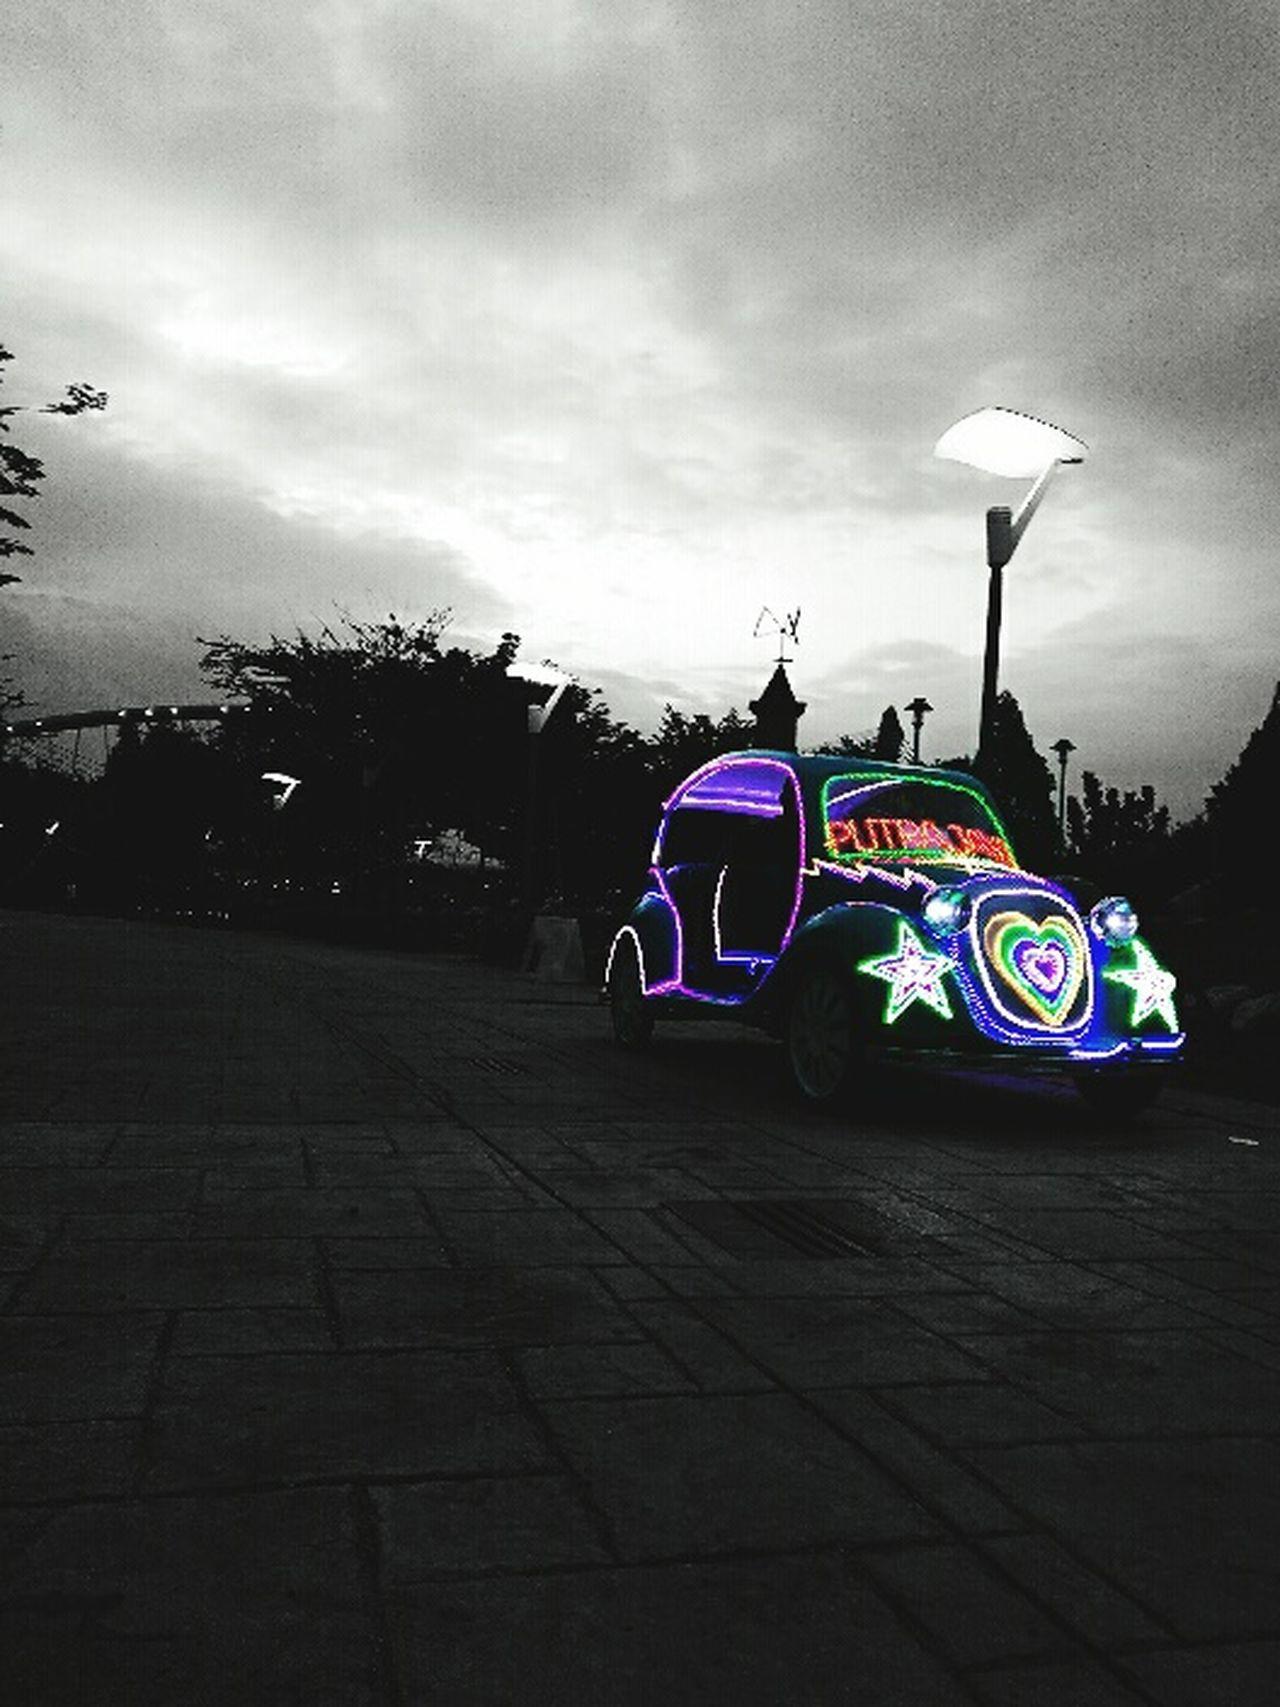 Putrajaya Fun Ride Cabby Malaysia Outdoors Illuminated Car